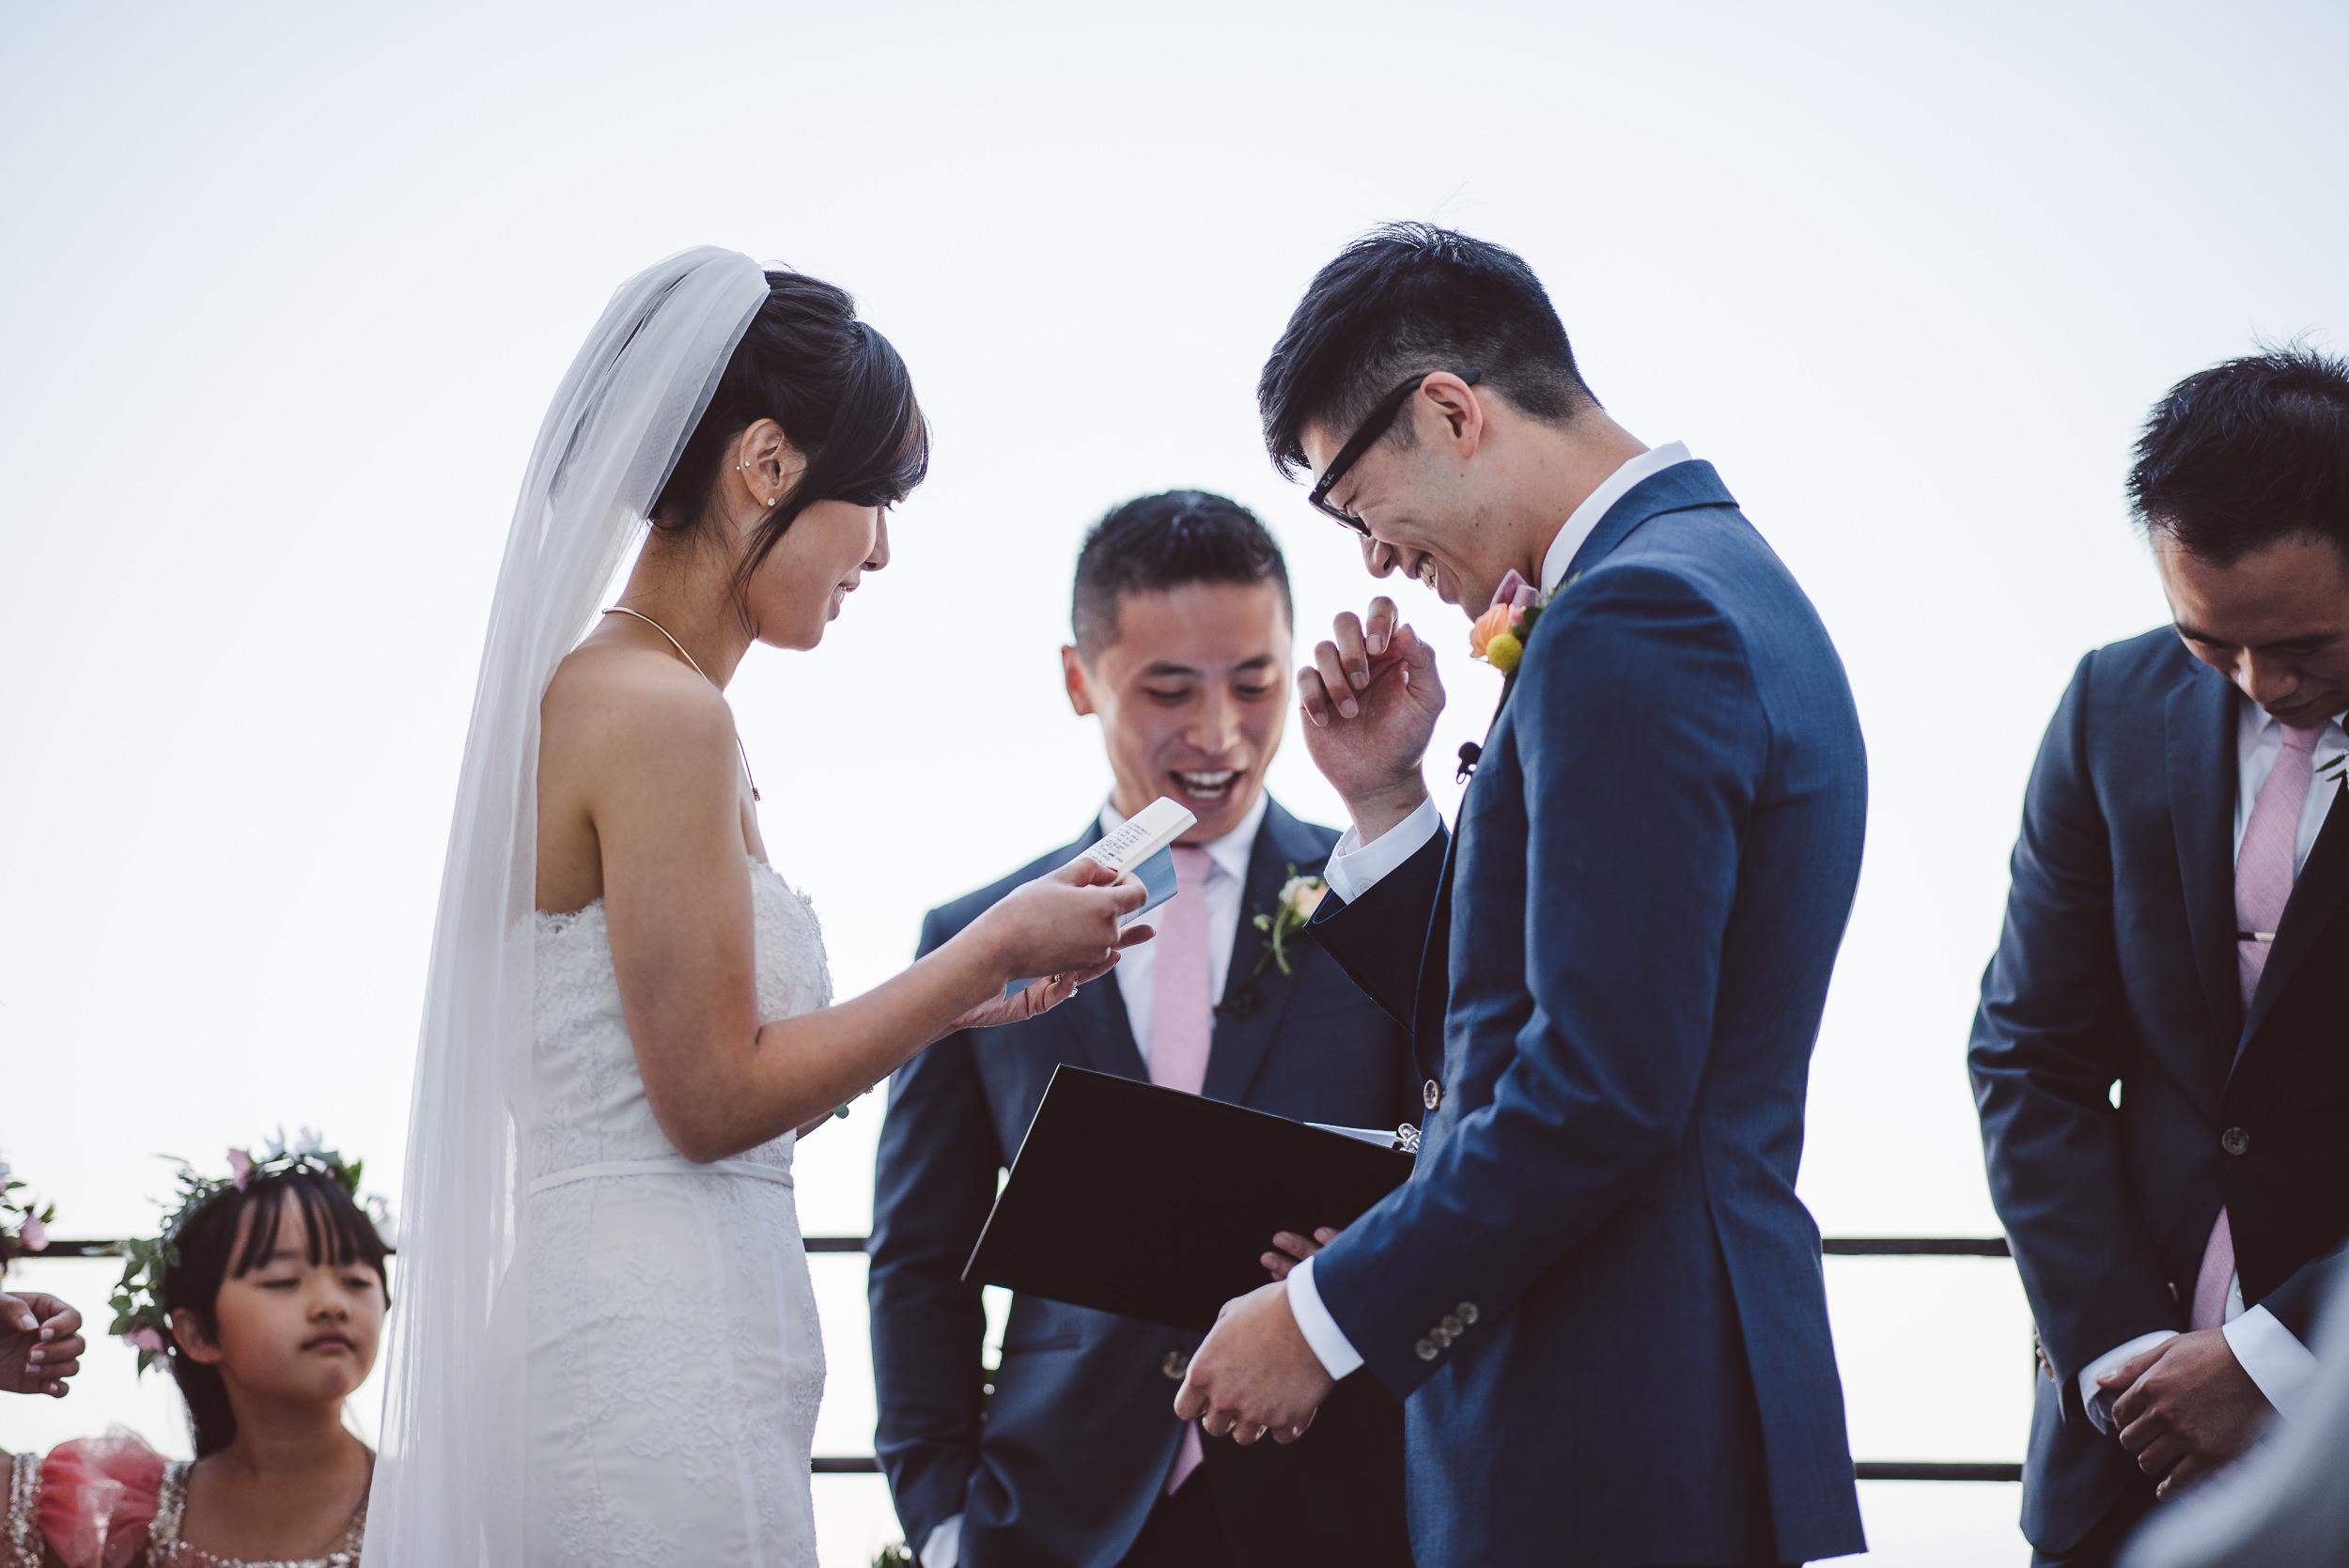 Loews-Regency-San-Francisco-Wedding-Photography-036.jpg